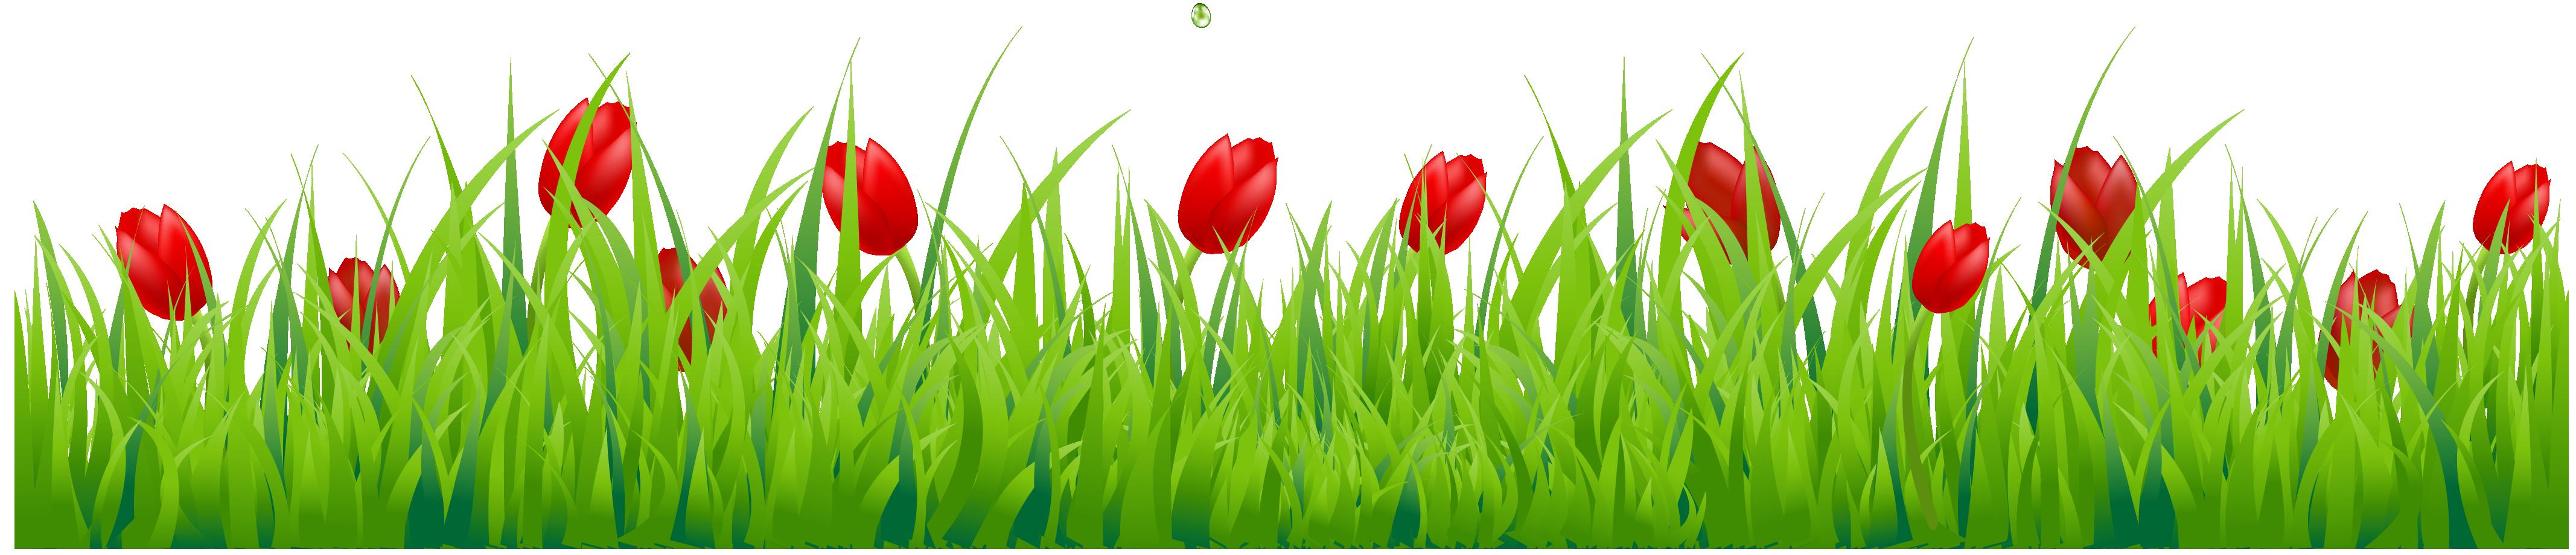 Tulip clipart border #5